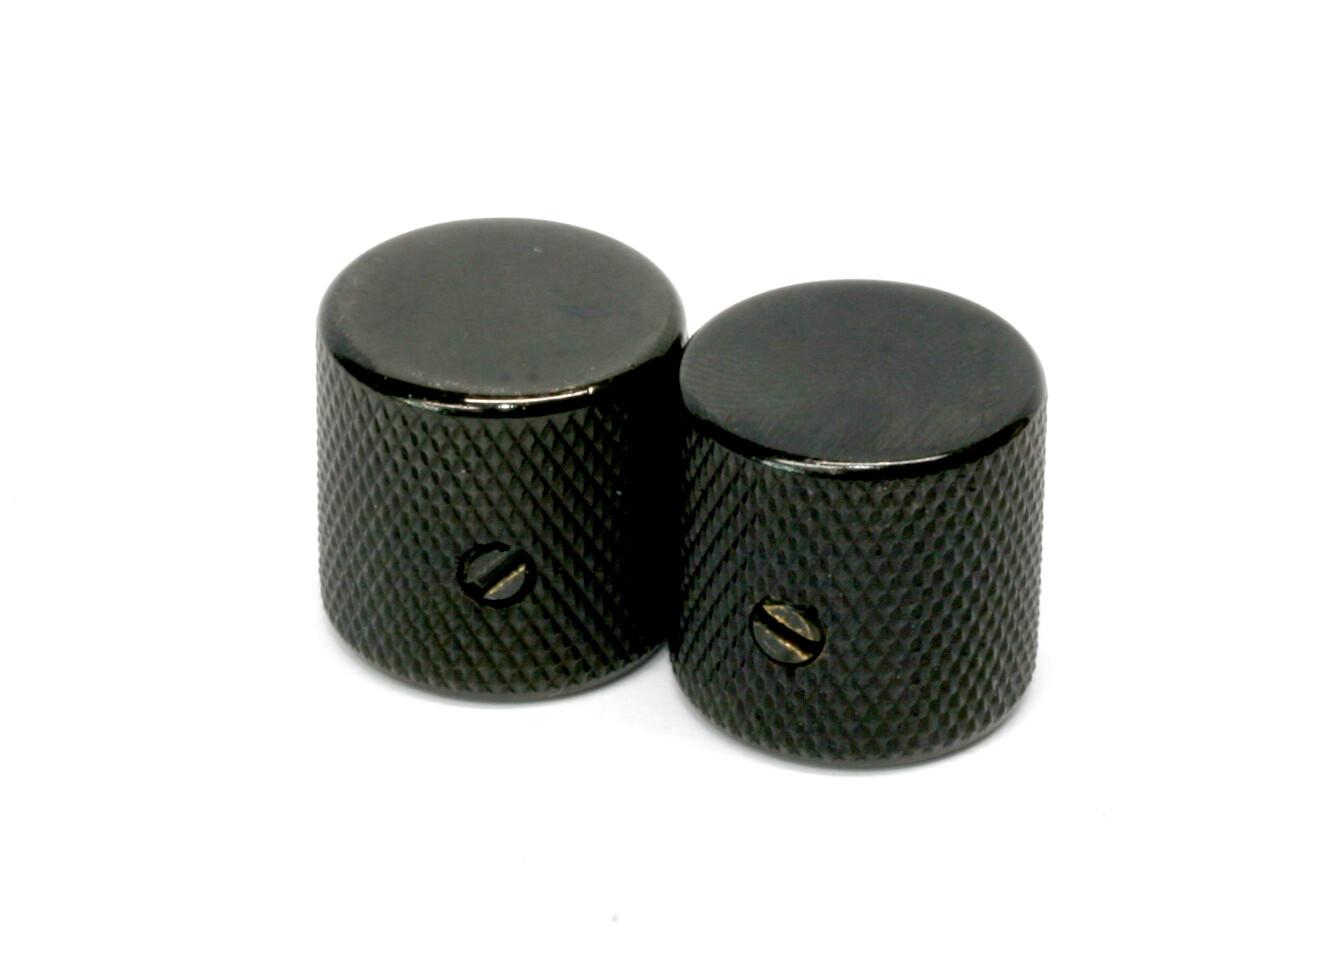 Black Barrel knobs (2), Gotoh, with set screw, fits USA split shaft pots